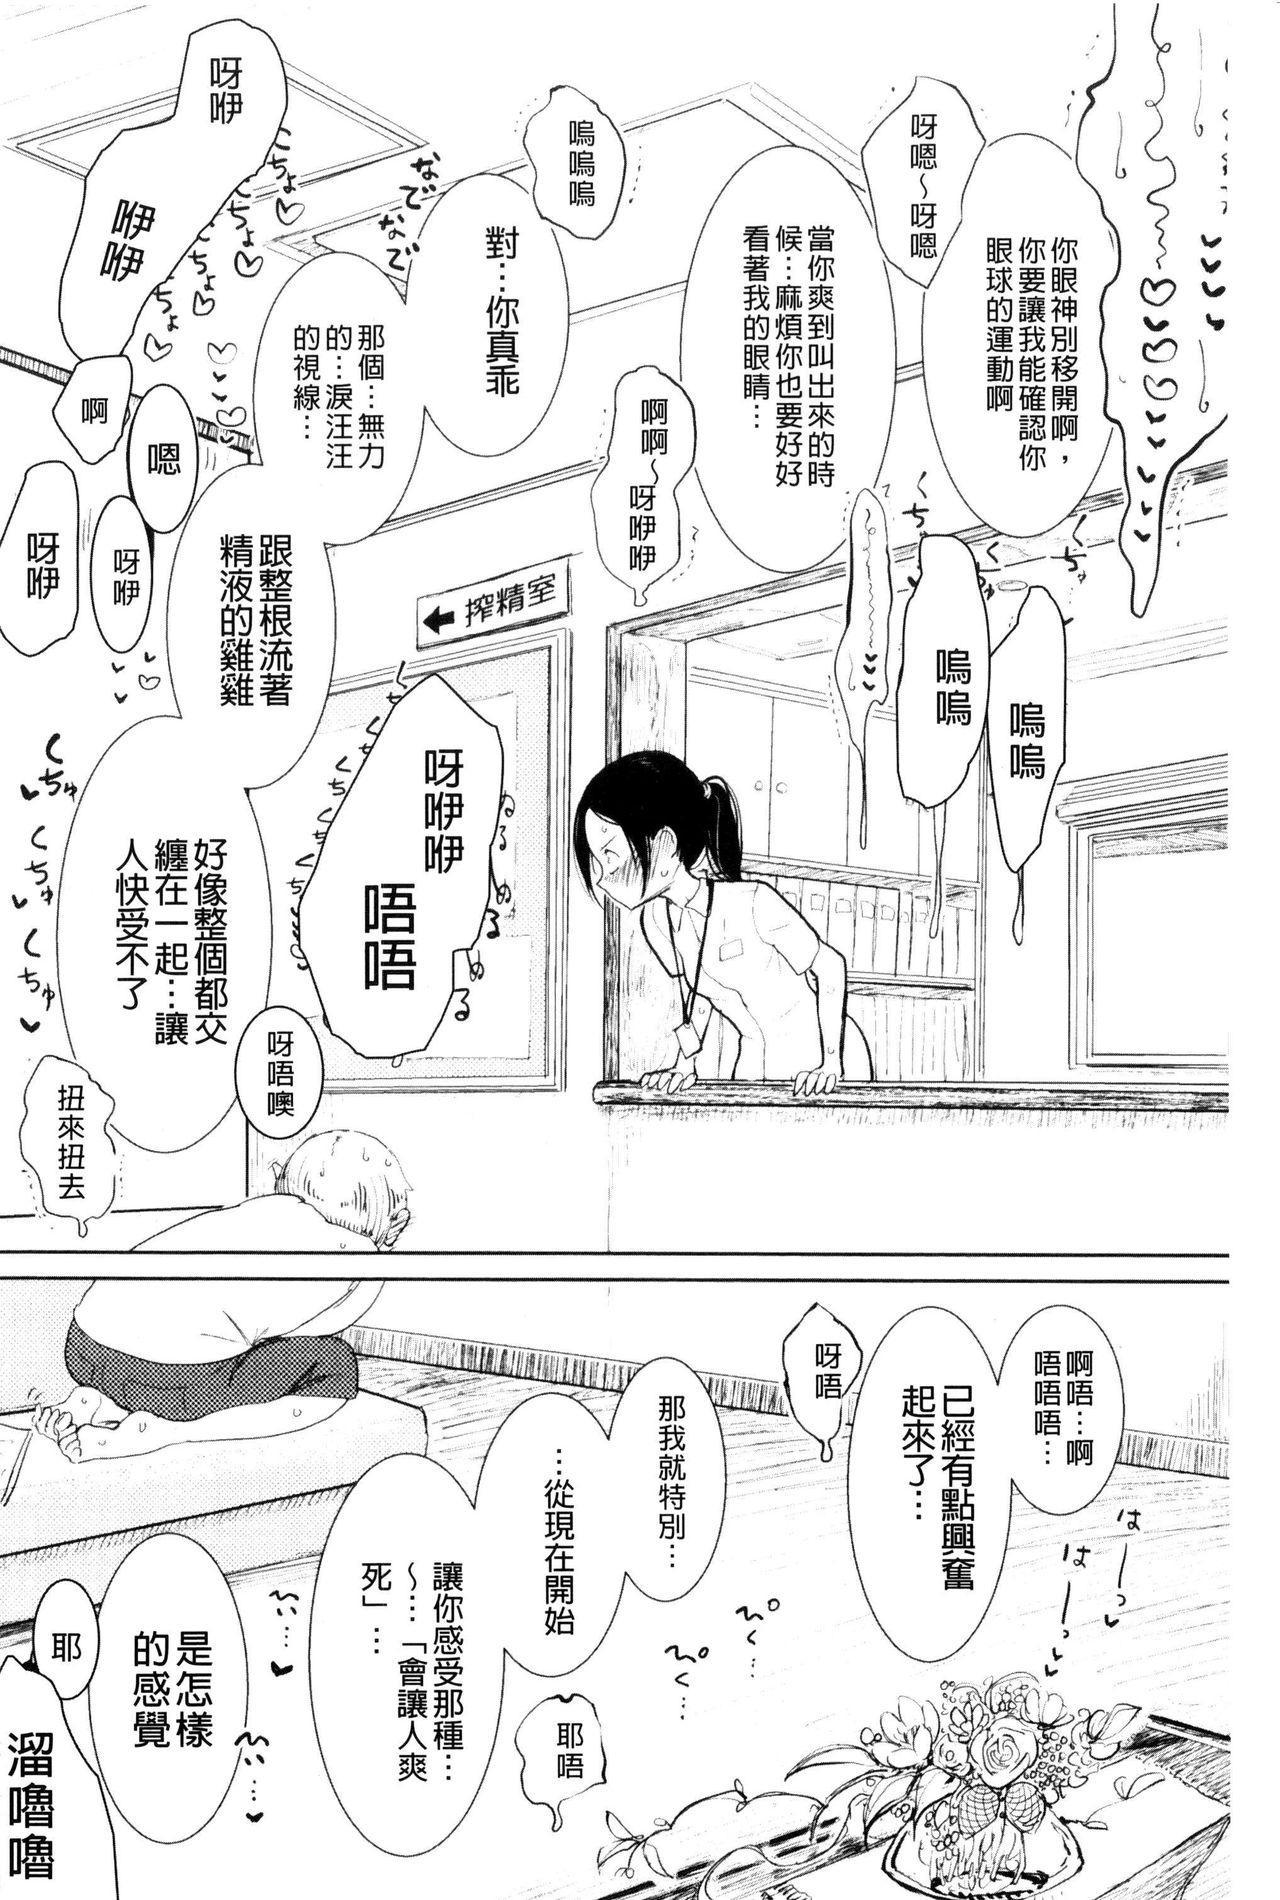 [Dhibi] Sono Yubisaki de Korogashite - Please Caress it at the Finger-tip. [Chinese] 183